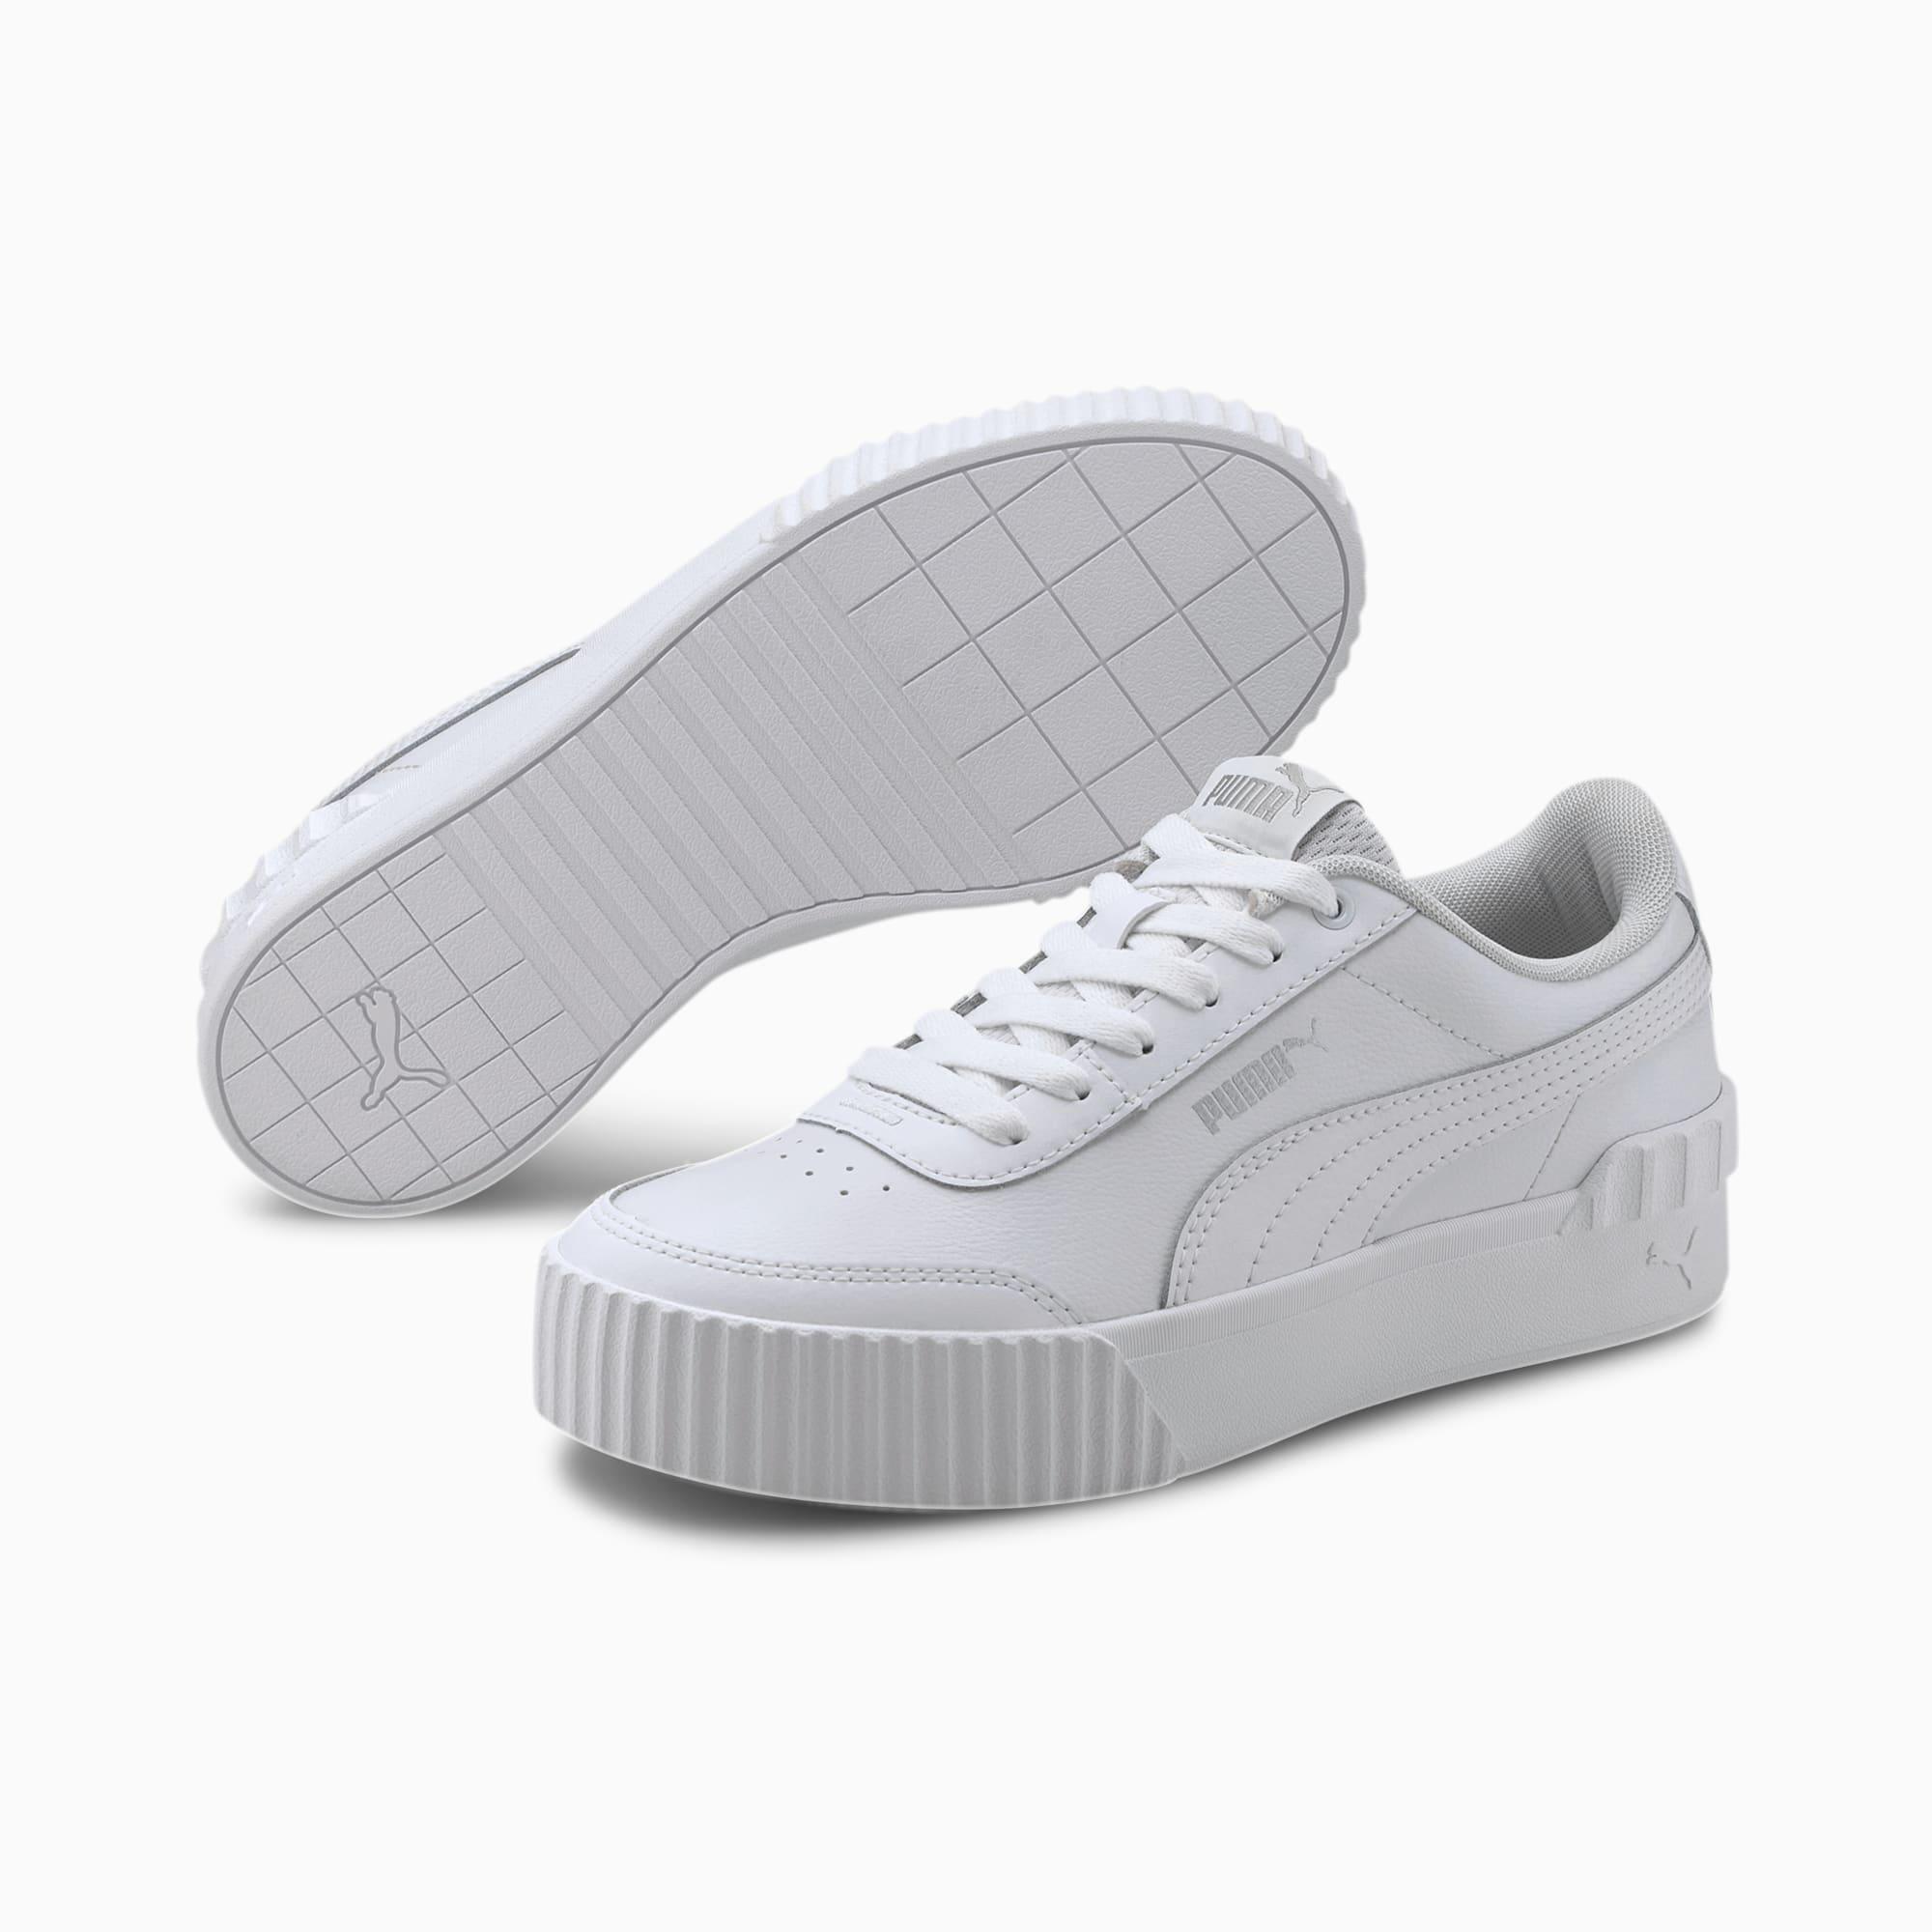 Carina Lift TW Women's Sneakers